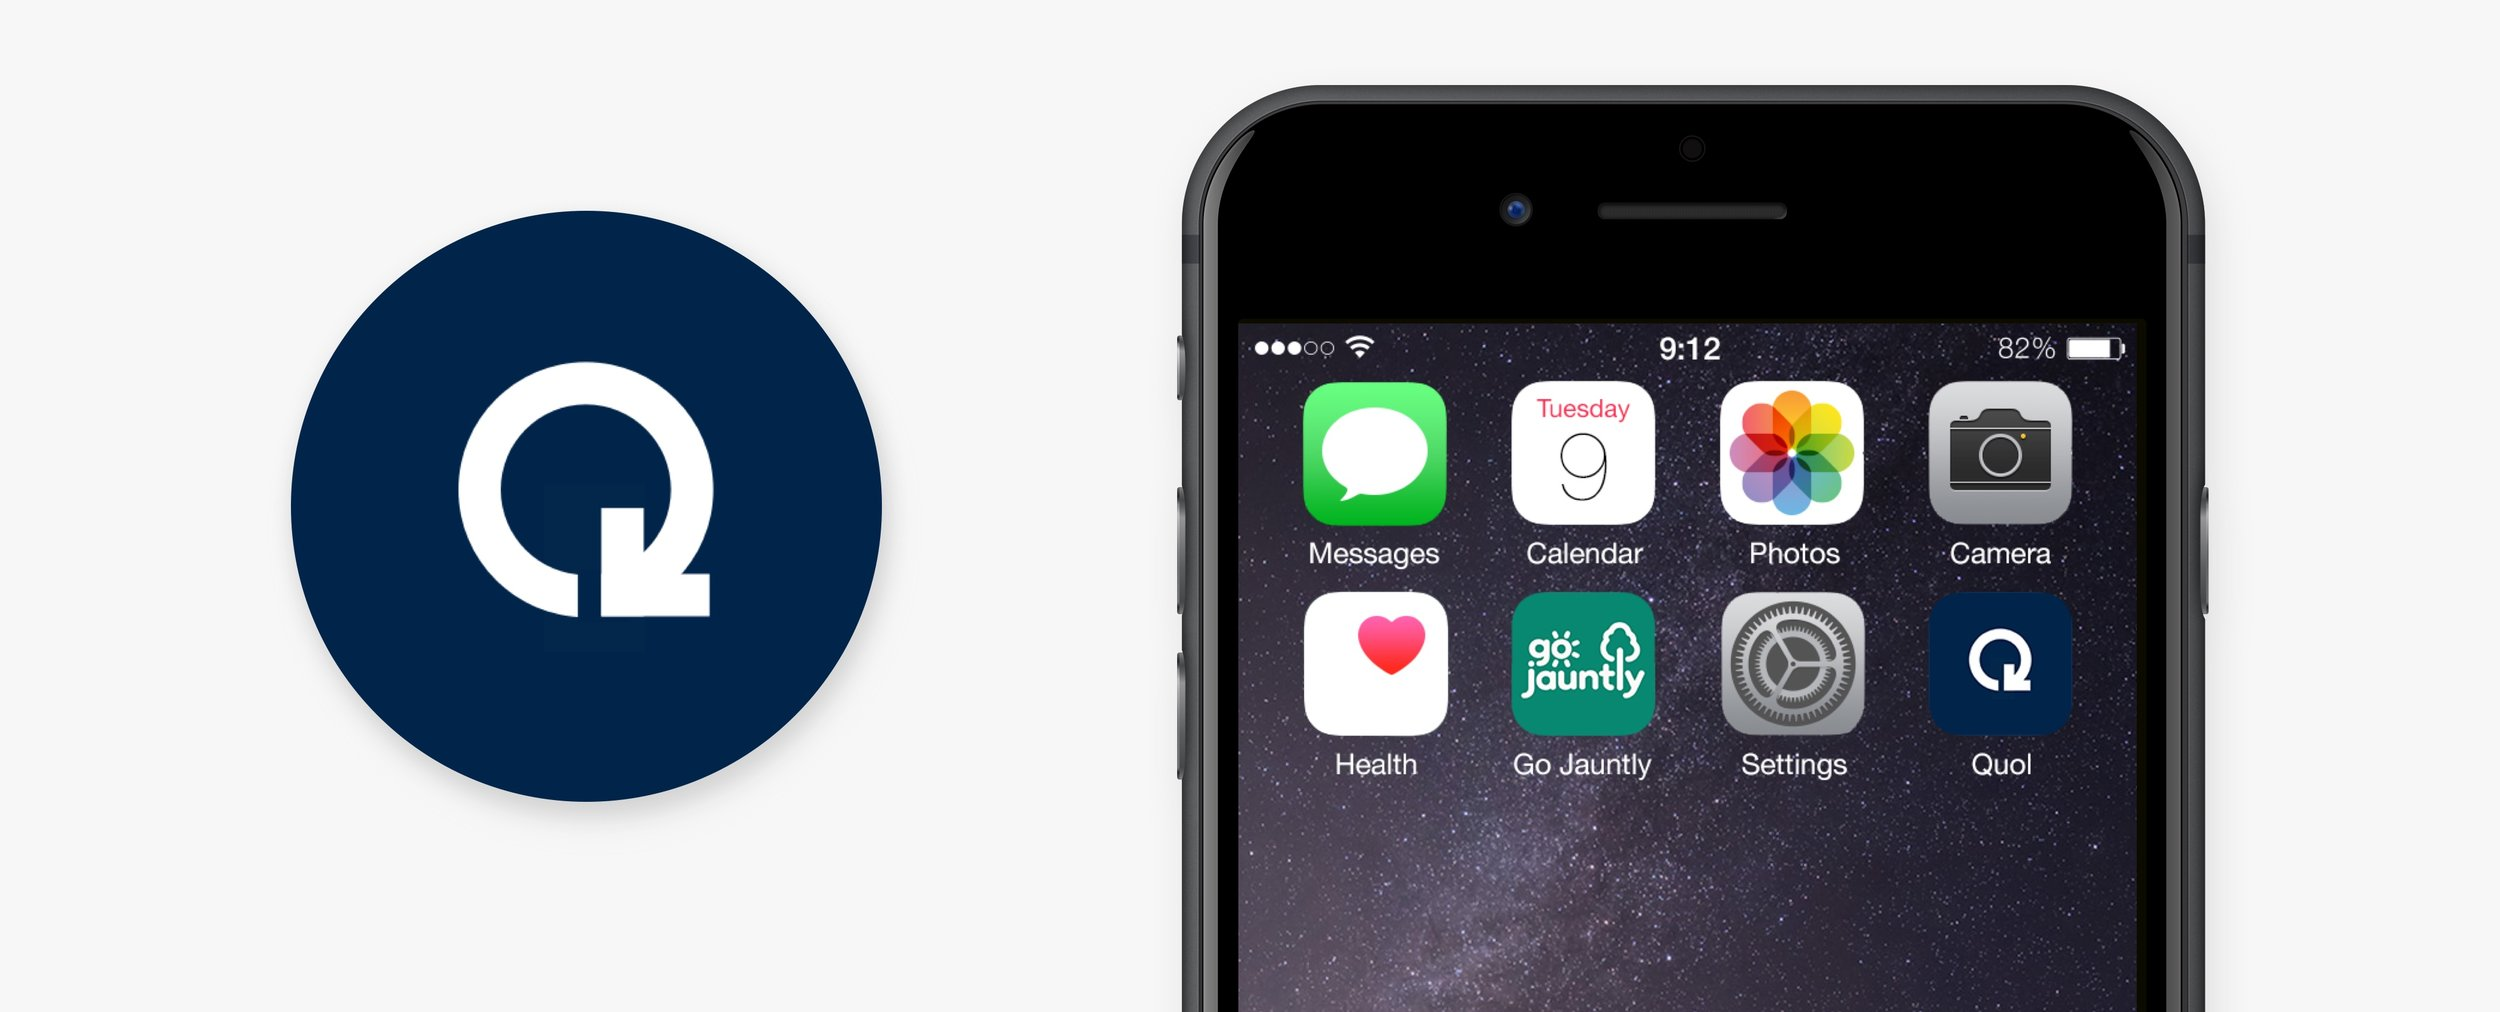 Quol-logo-lock-up-design-furthermore